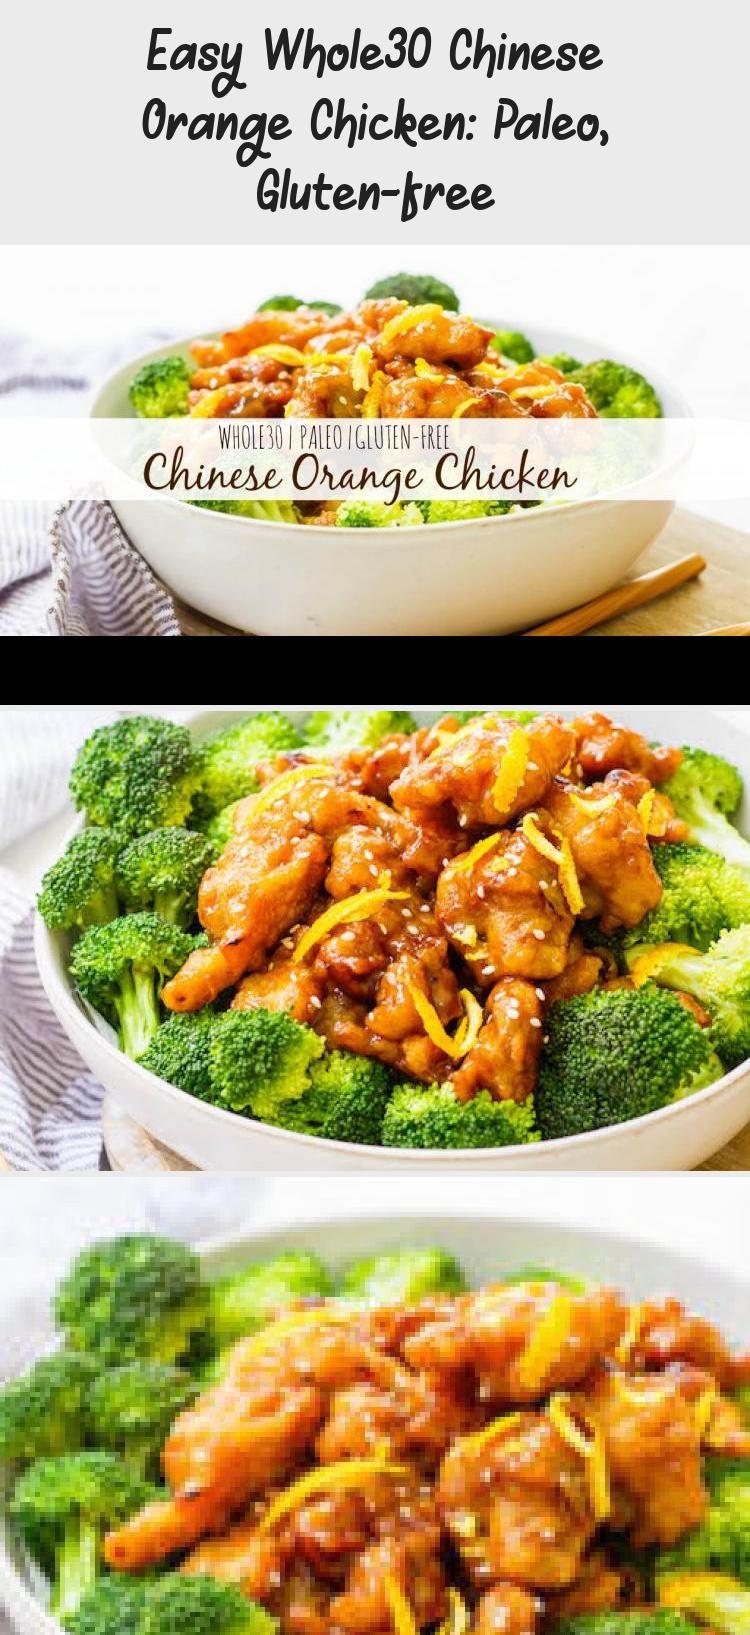 Easy Whole30 Chinese Orange Chicken: Paleo, Gluten-free #chineseorangechicken